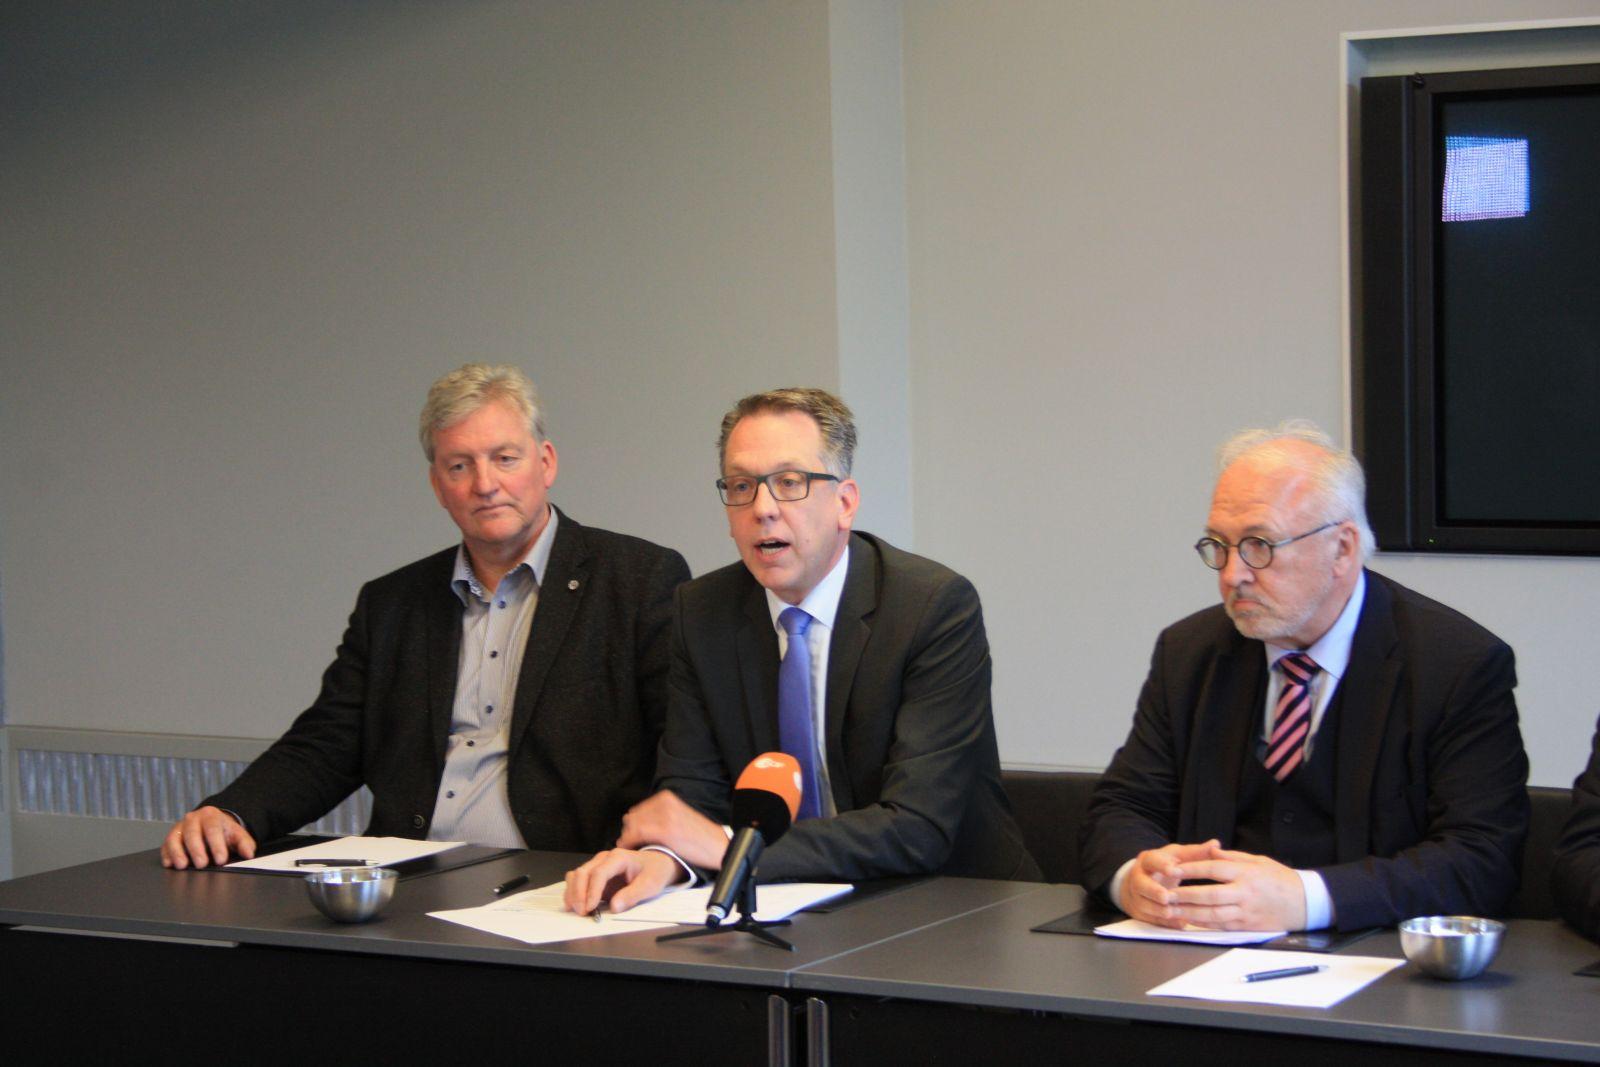 Wilfried Kley (VKA), Dr. Dirk Tenzer (VKA), Rudolf Henke (MB)